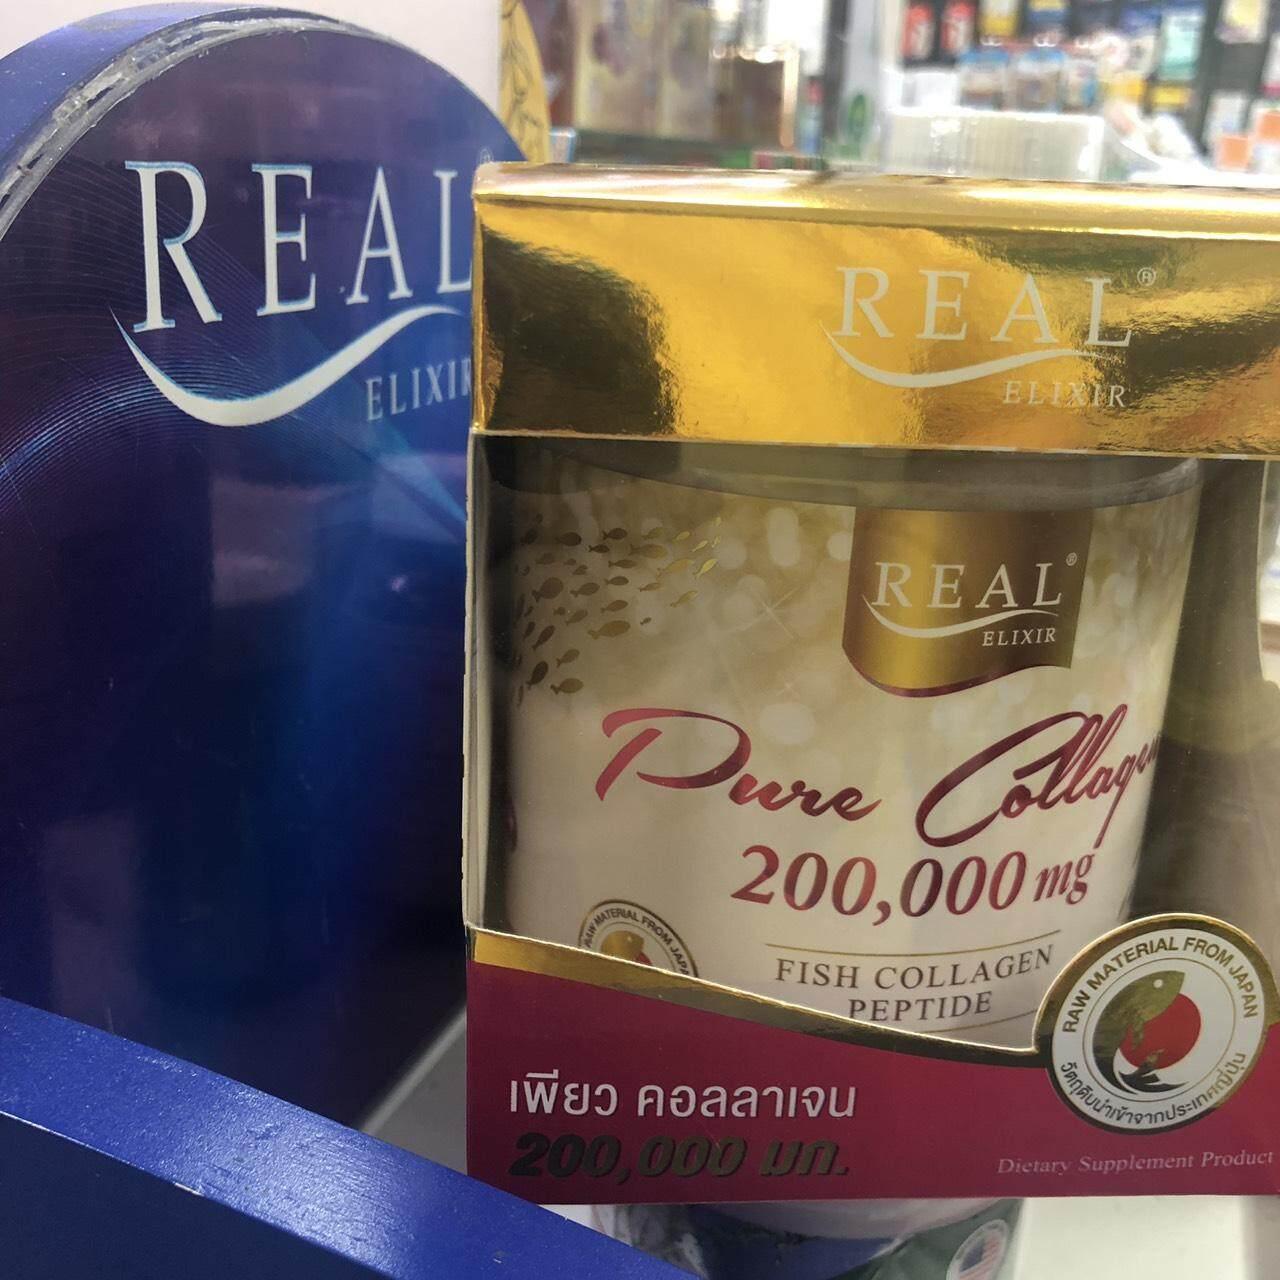 Real Elixir Pure Collagen 200,000 mg. x 1 กระป๋อง เรียล อิลิกเซอร์ เพียว คอลลาเจน เปปไทด์ บำรุงผิว ผิวใส บำรุงข้อ